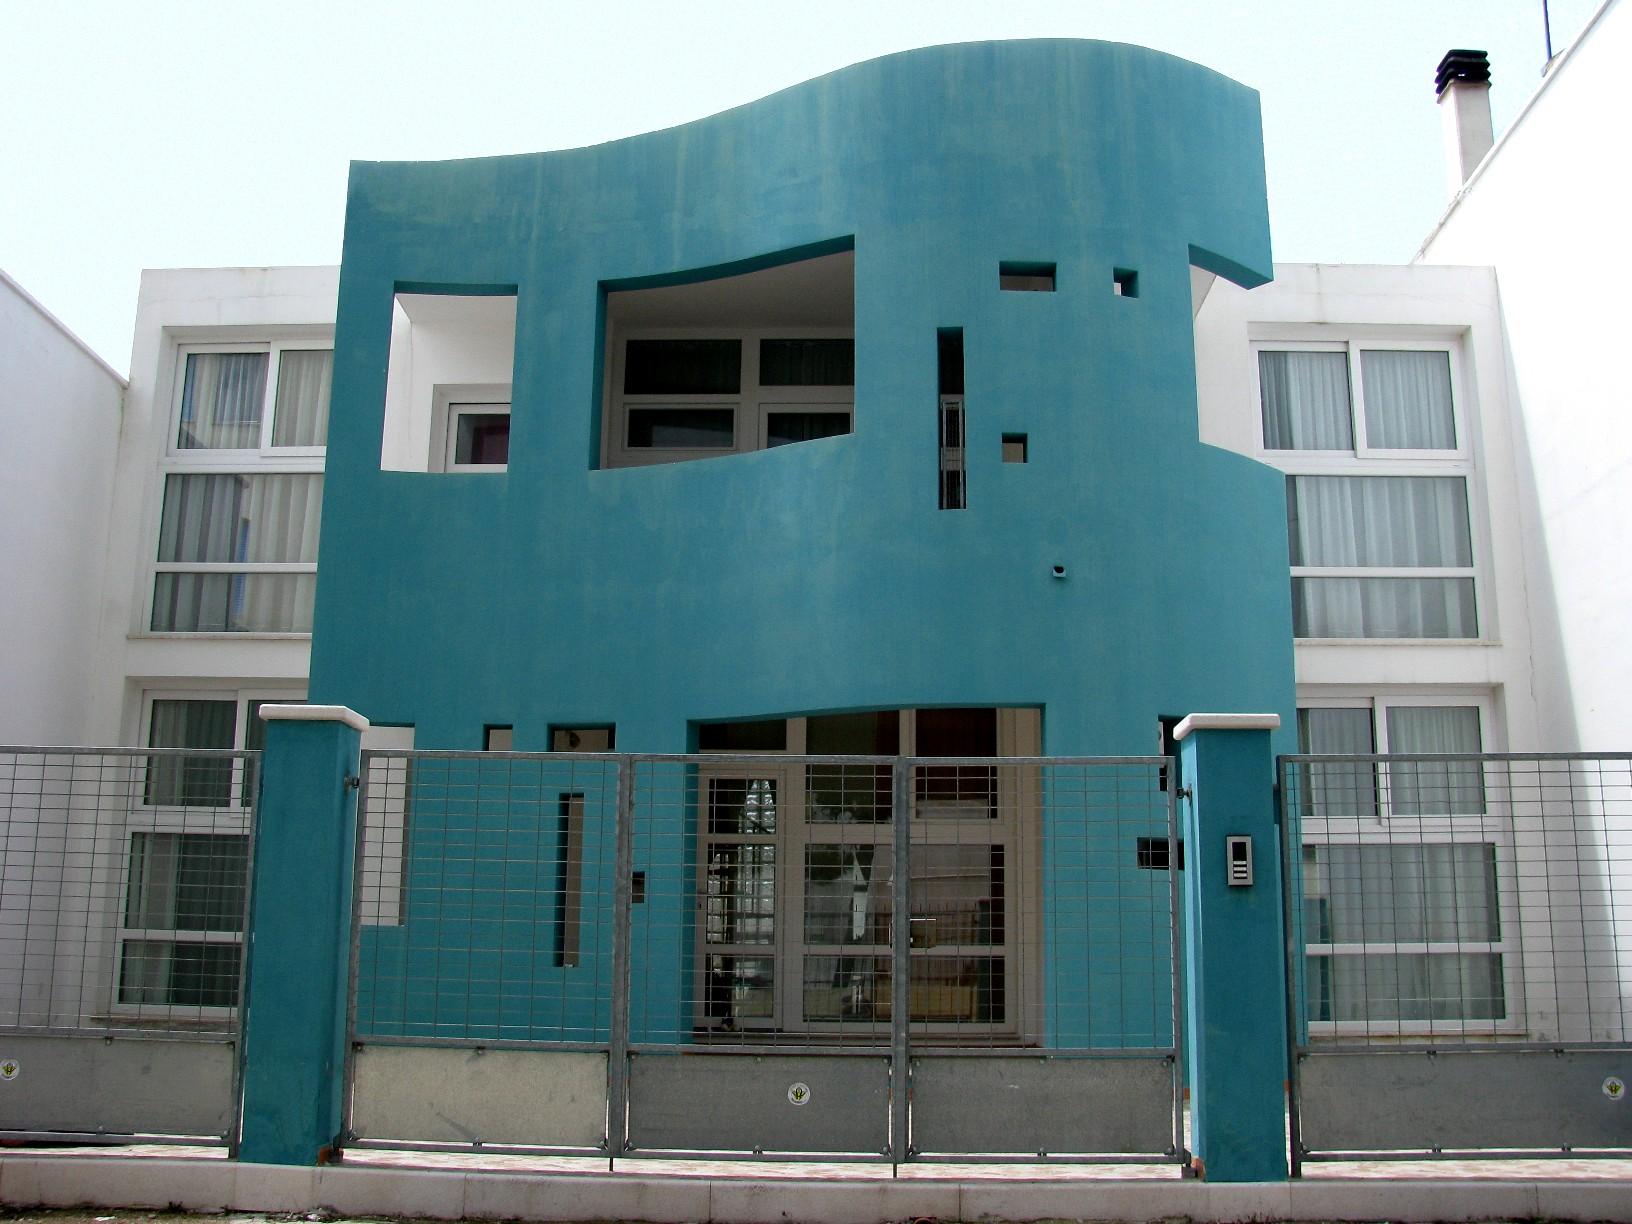 Top casa moderna architettura images for pinterest tattoos - Architettura casa moderna ...